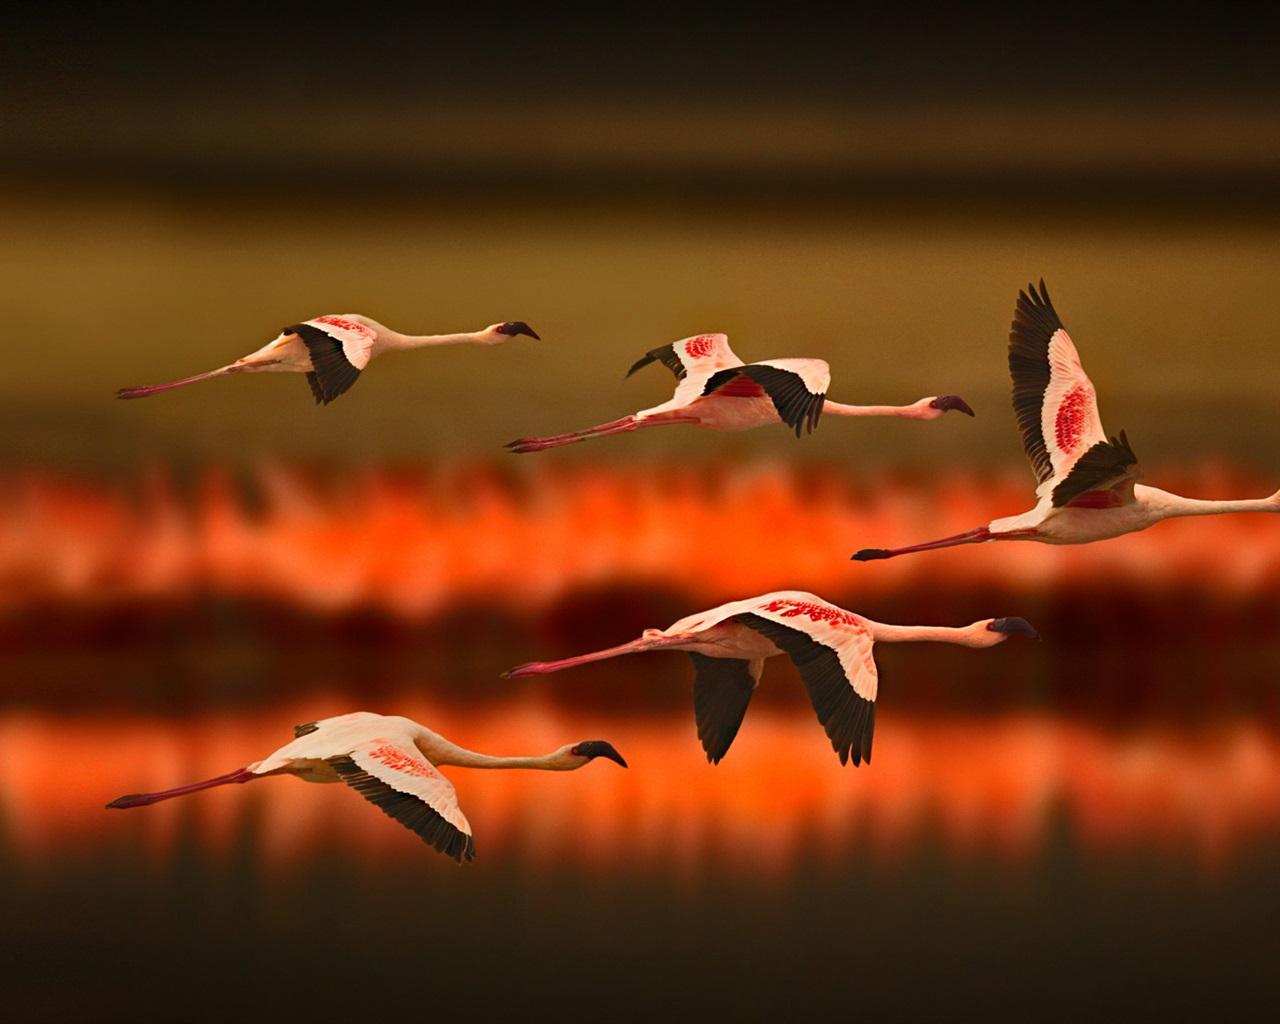 Aninimal Book: Wallpaper Greater Flamingos flying at sunset 1920x1080 ...